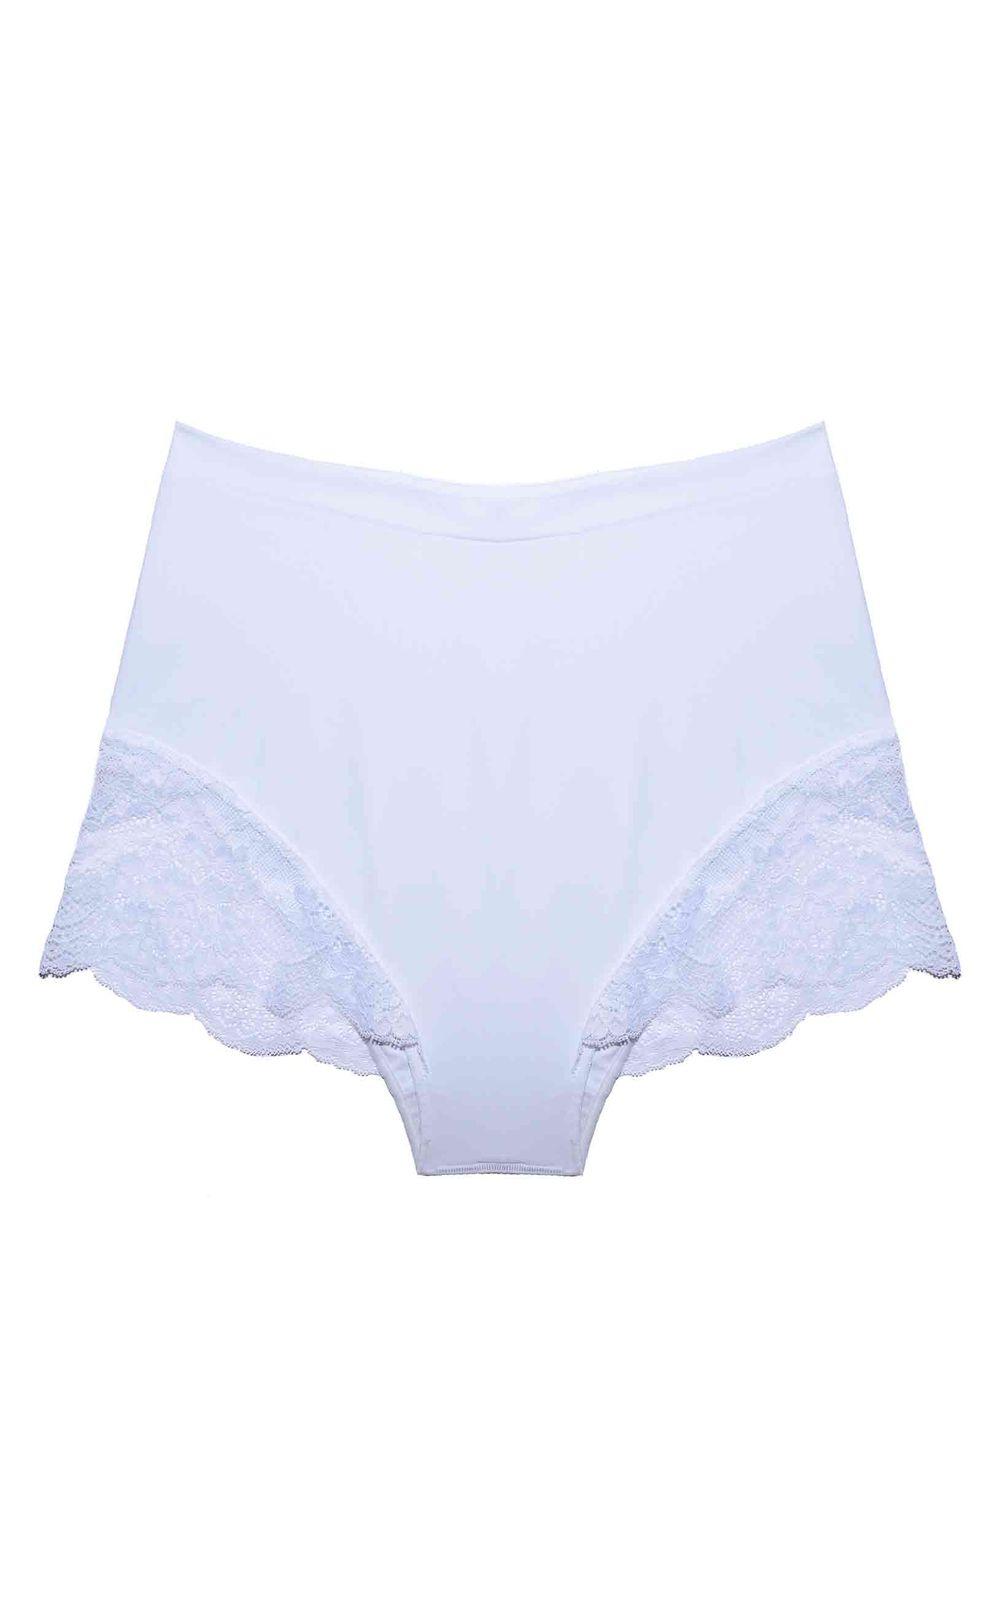 Foto 1 - Calcinha Hot Pants Renda/Tech Pro Branca